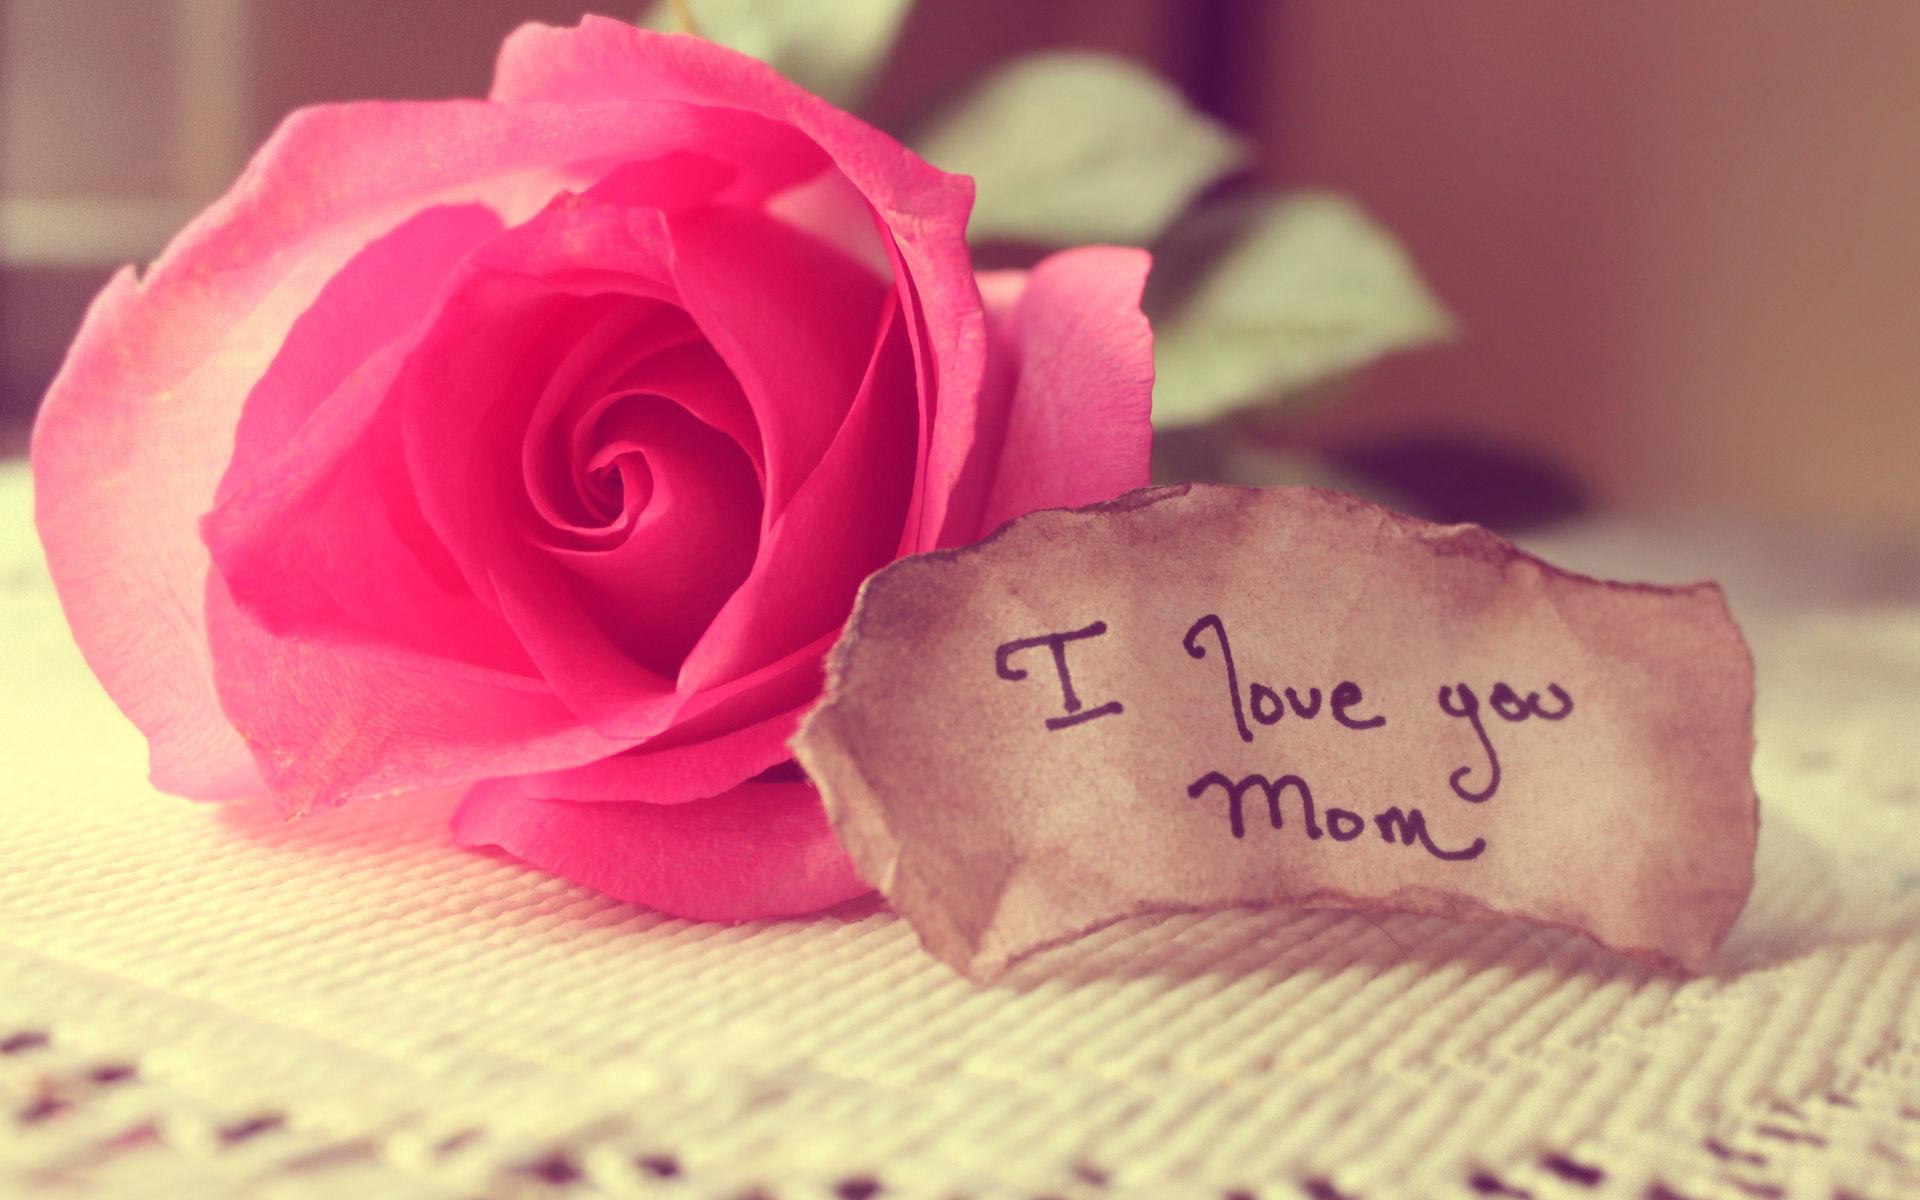 I love you mom handwritten note